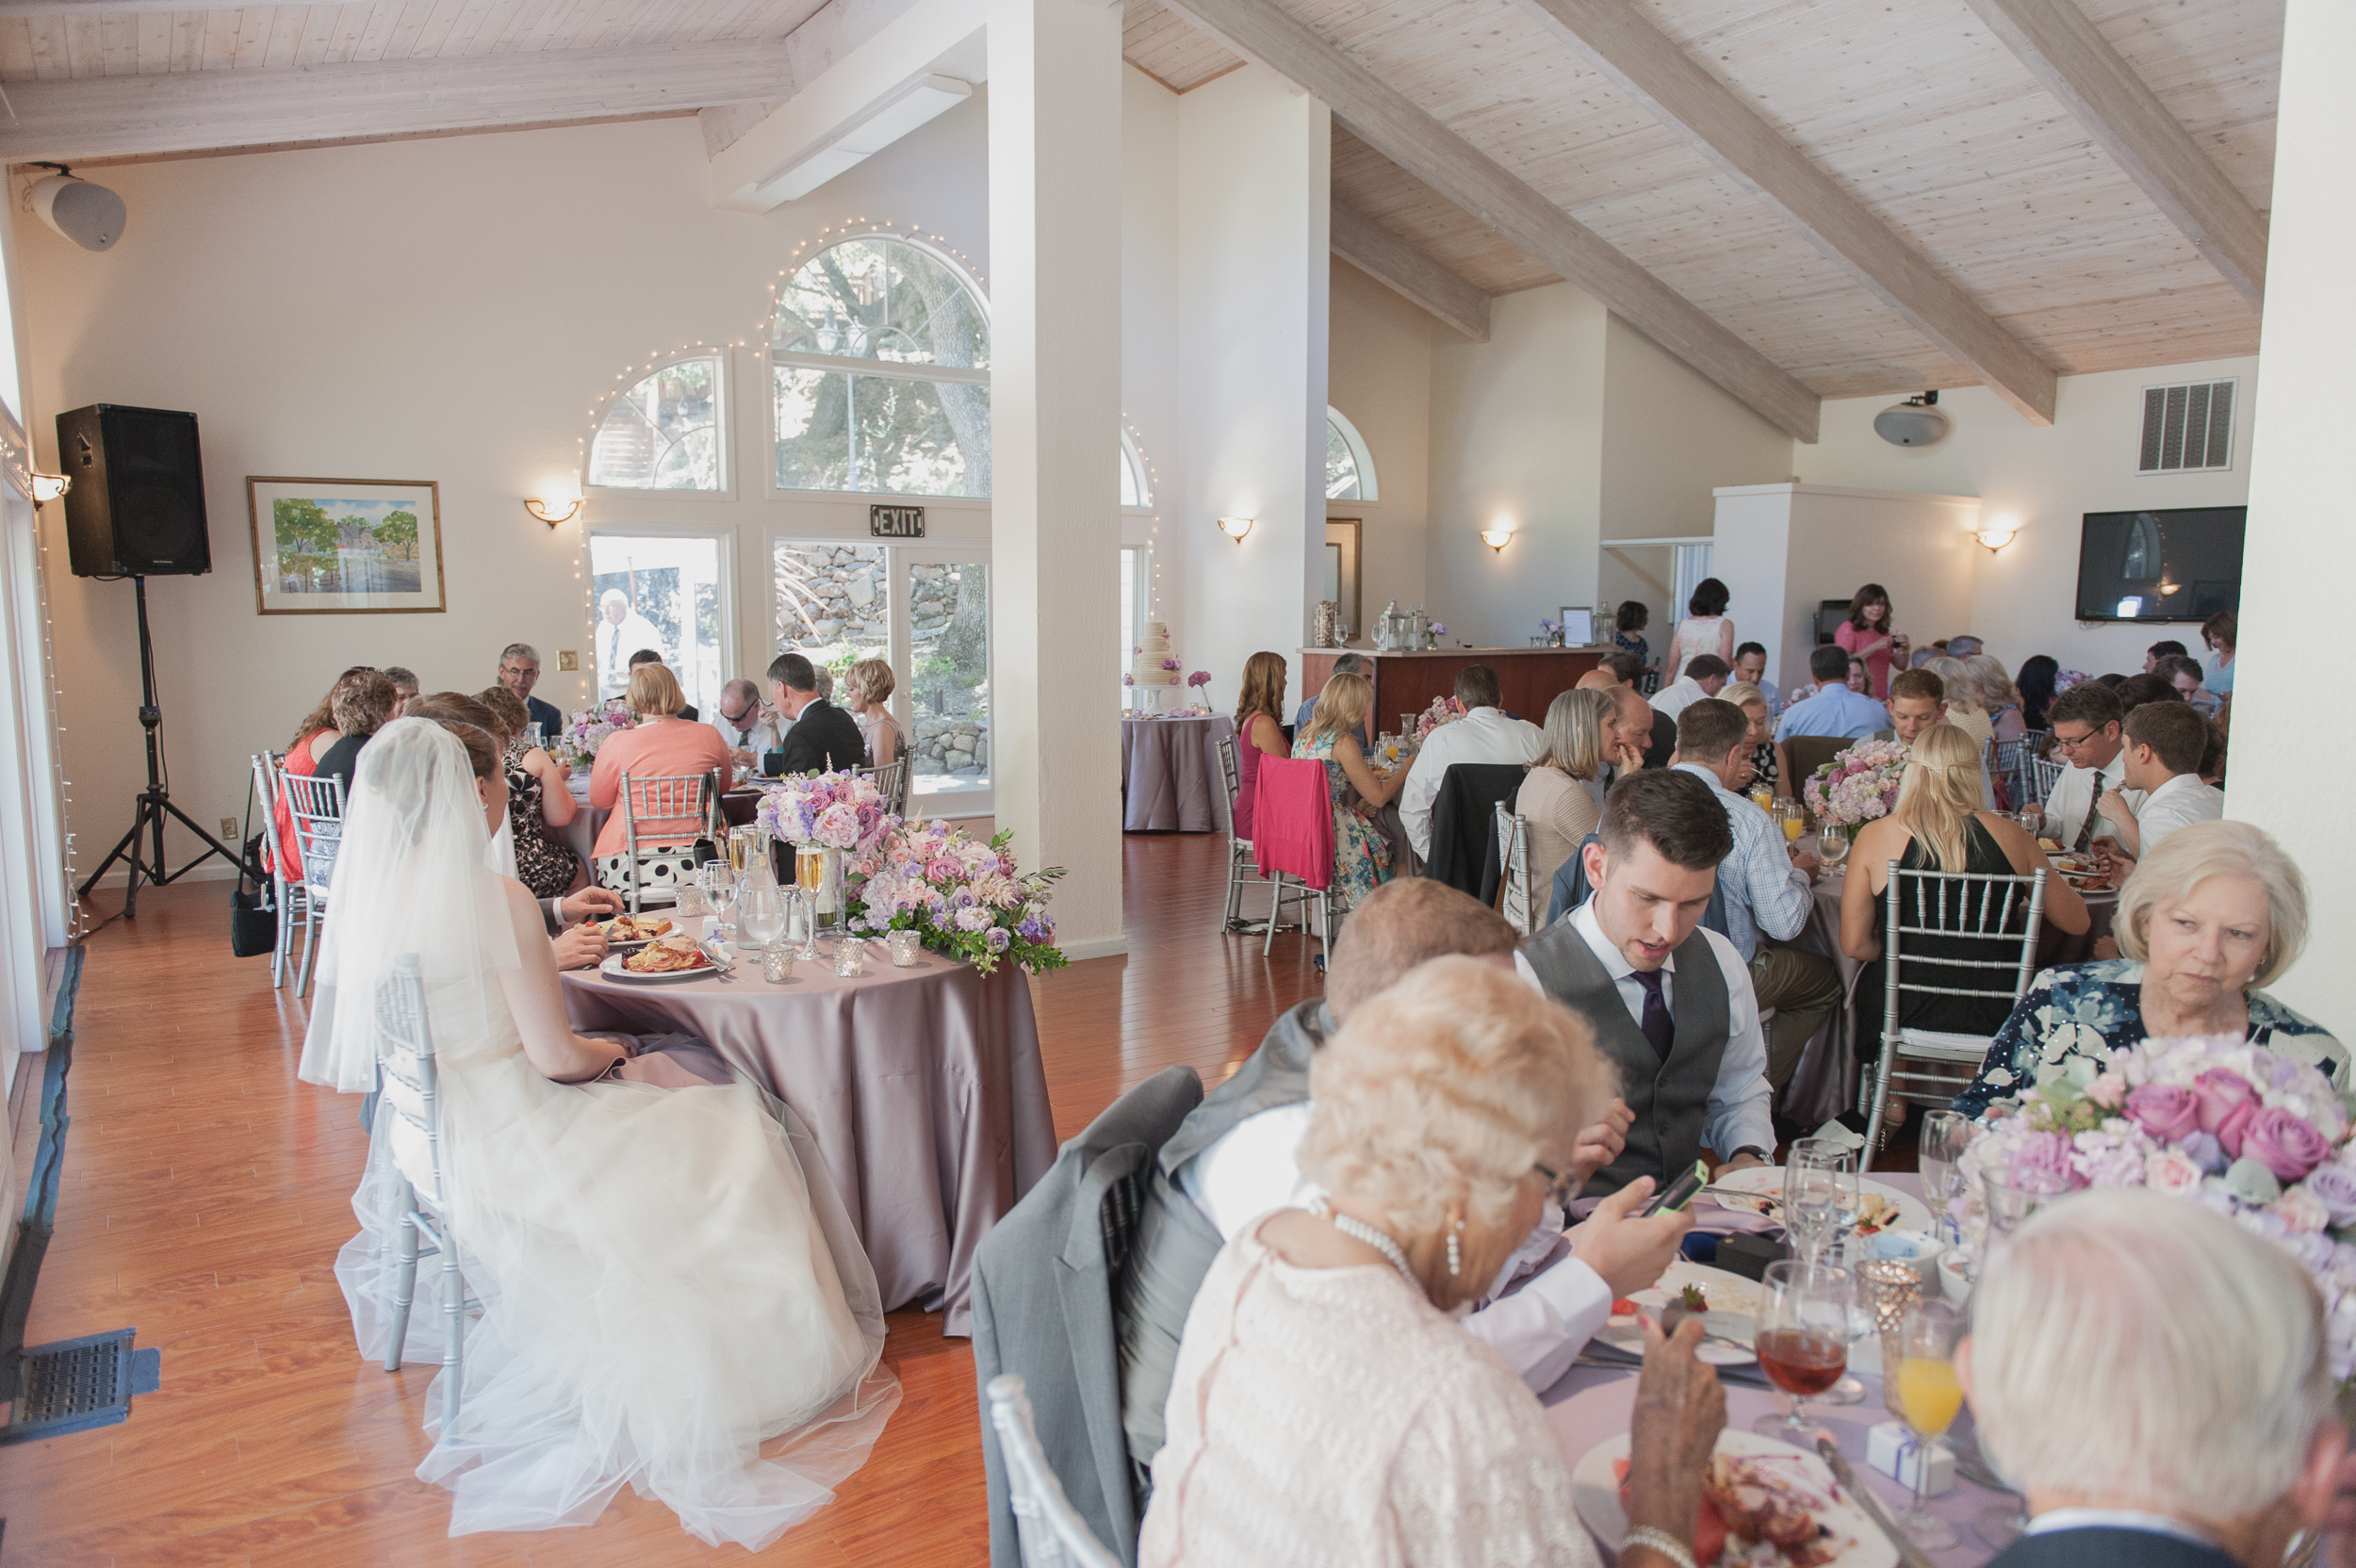 elliston-vineyards-morning-wedding-vivianchen-032.jpg